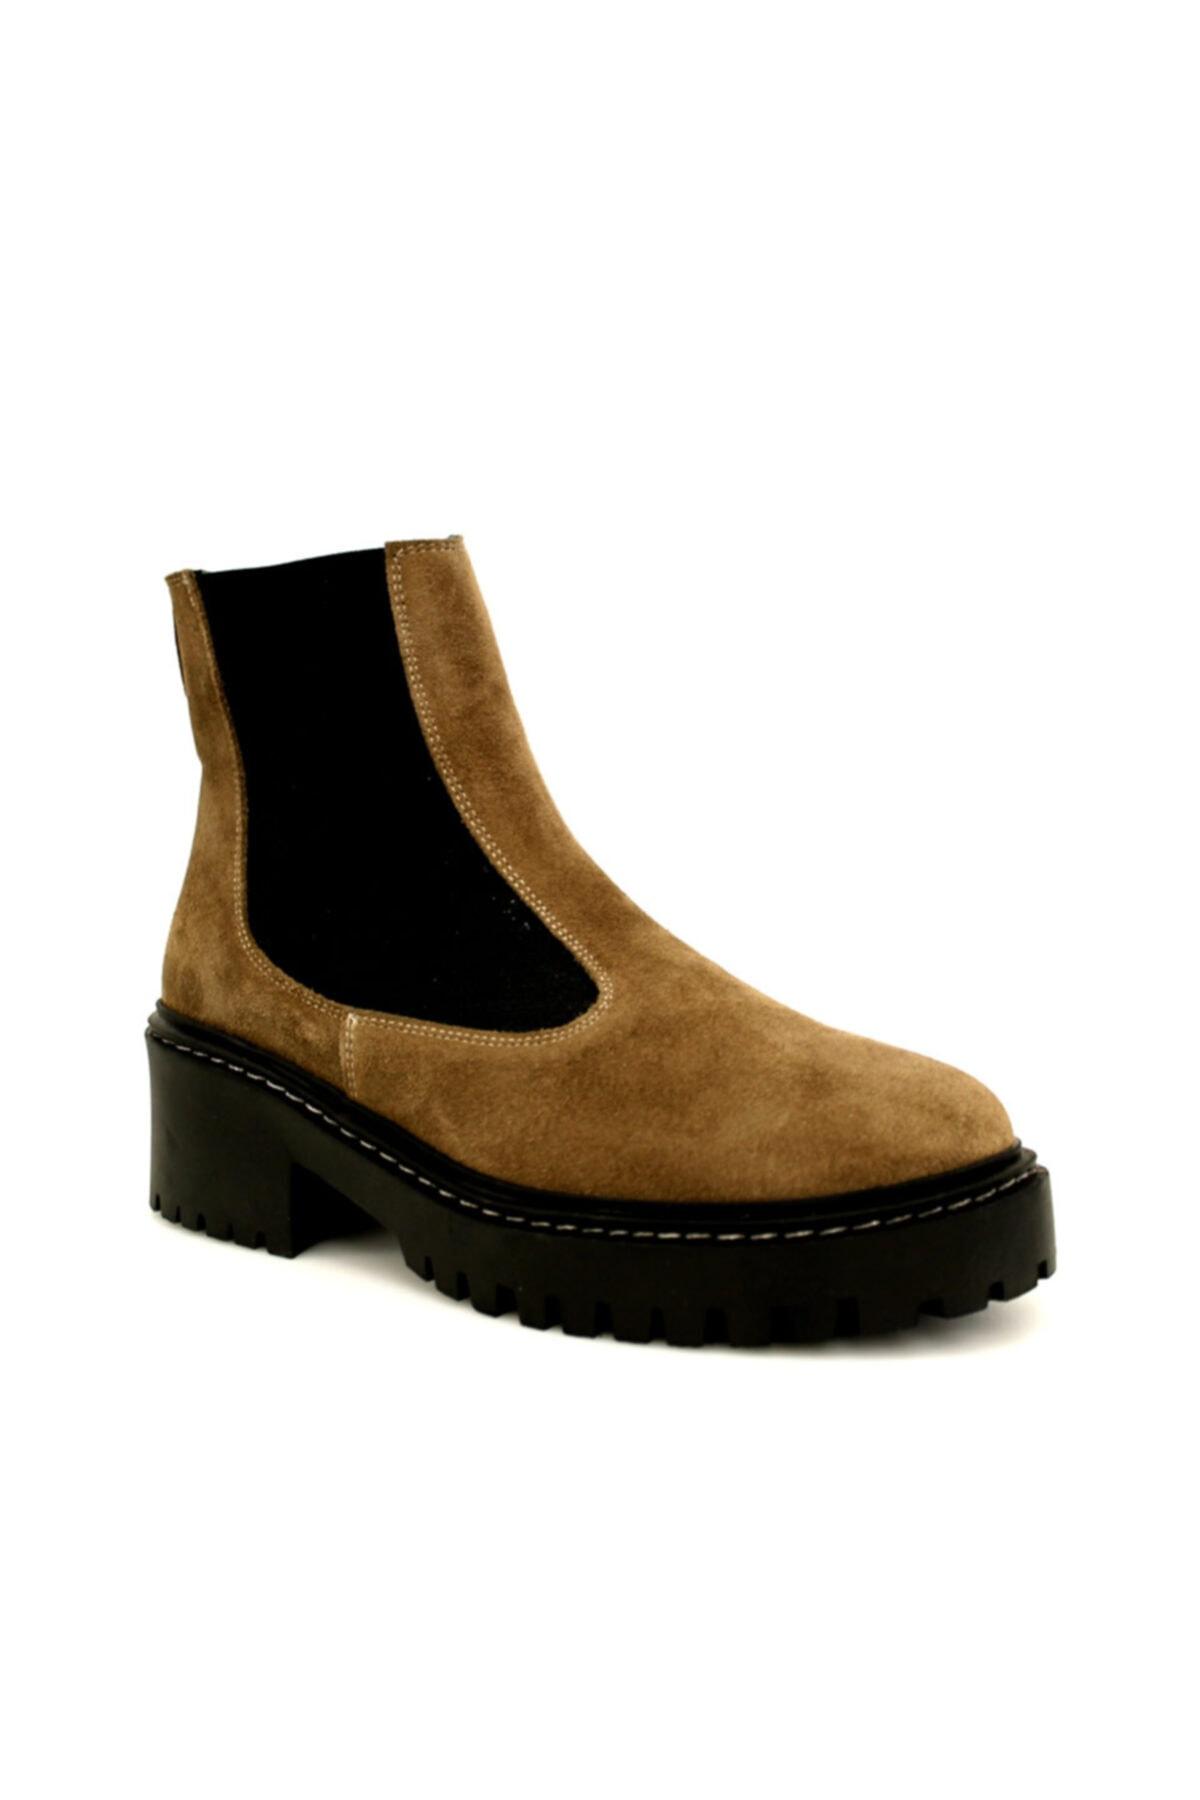 Beta Shoes Kadın Hakiki Deri Bot Süet Vizon 1